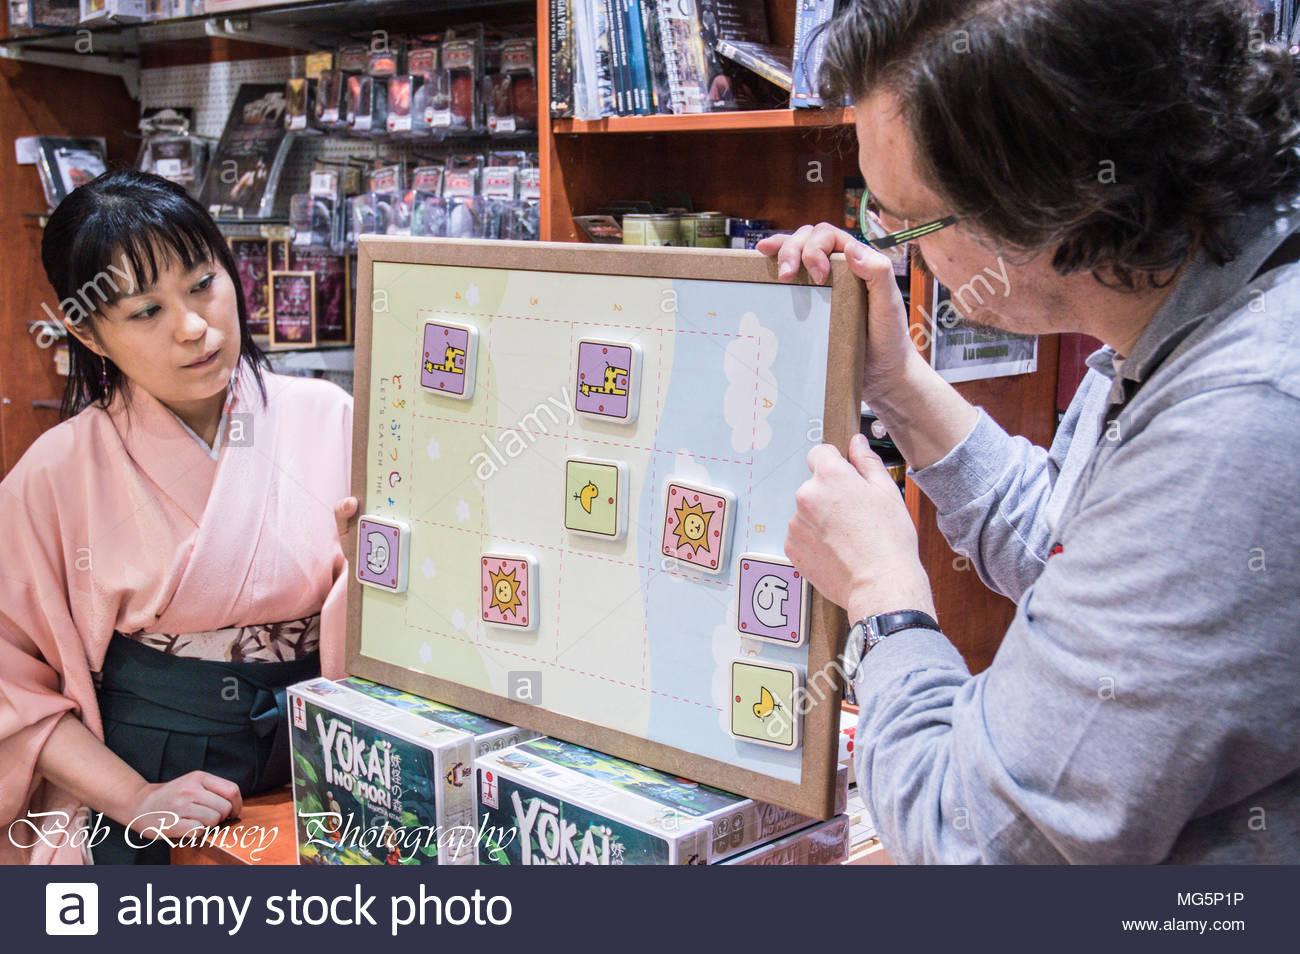 Shogi japonese game- Shogi le jeux japonais - Stock Image